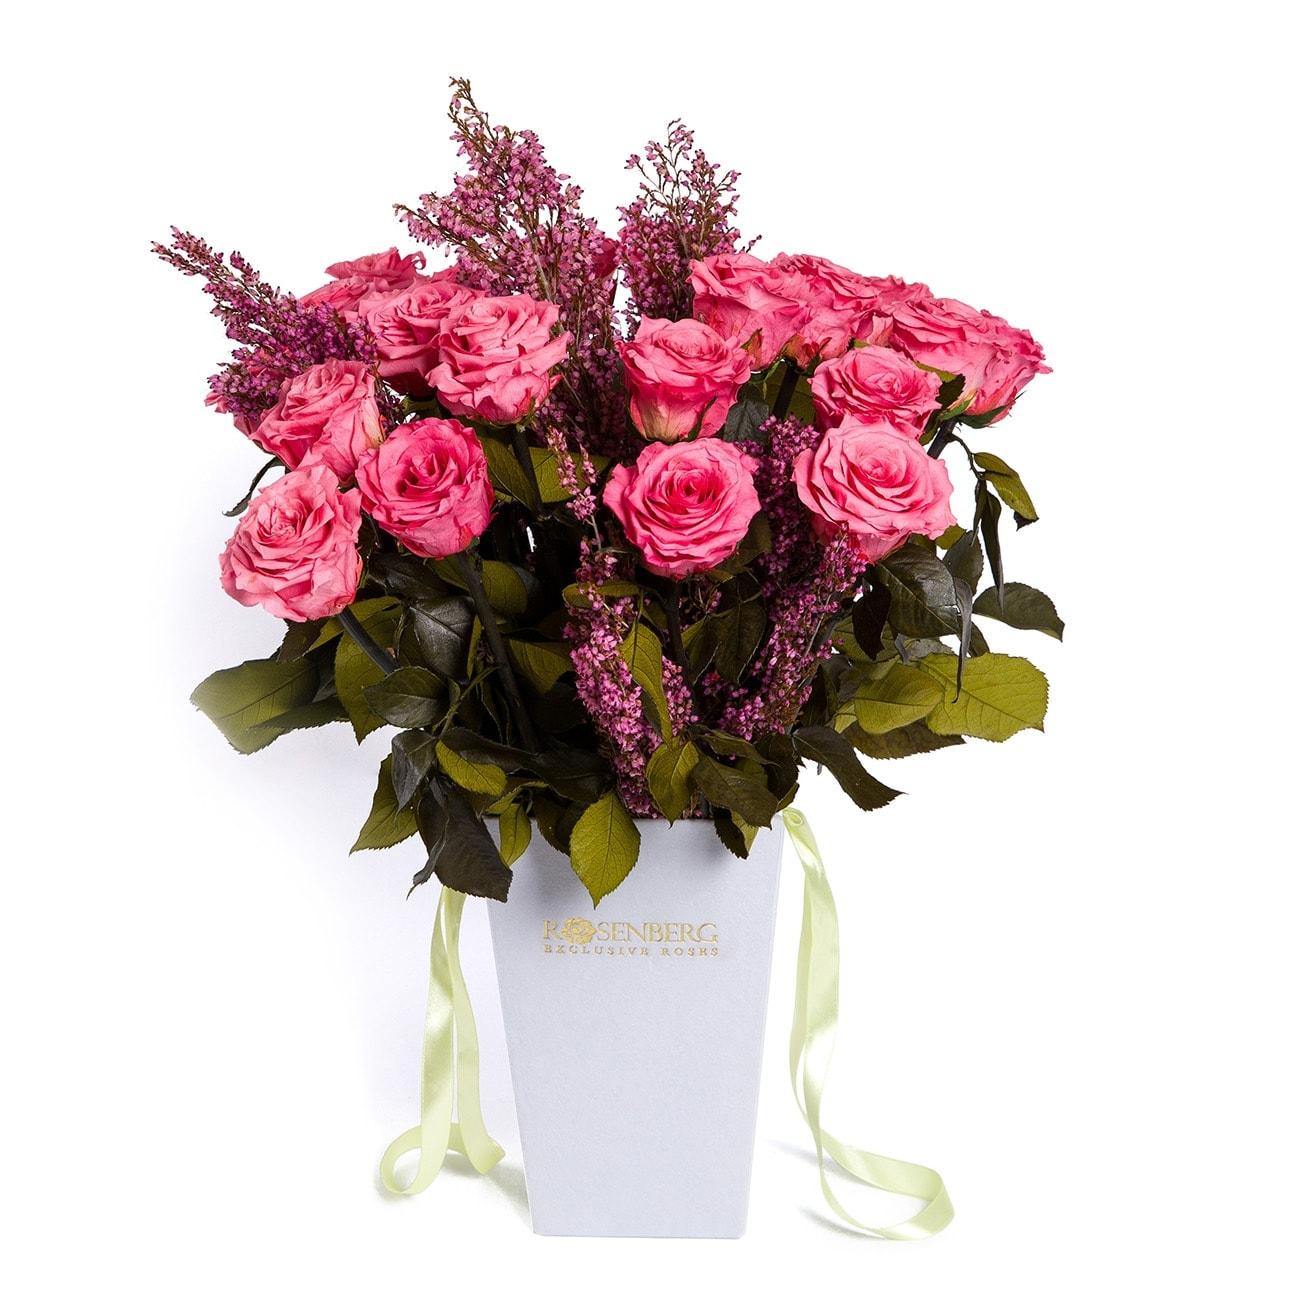 Roosid, lilled karbis